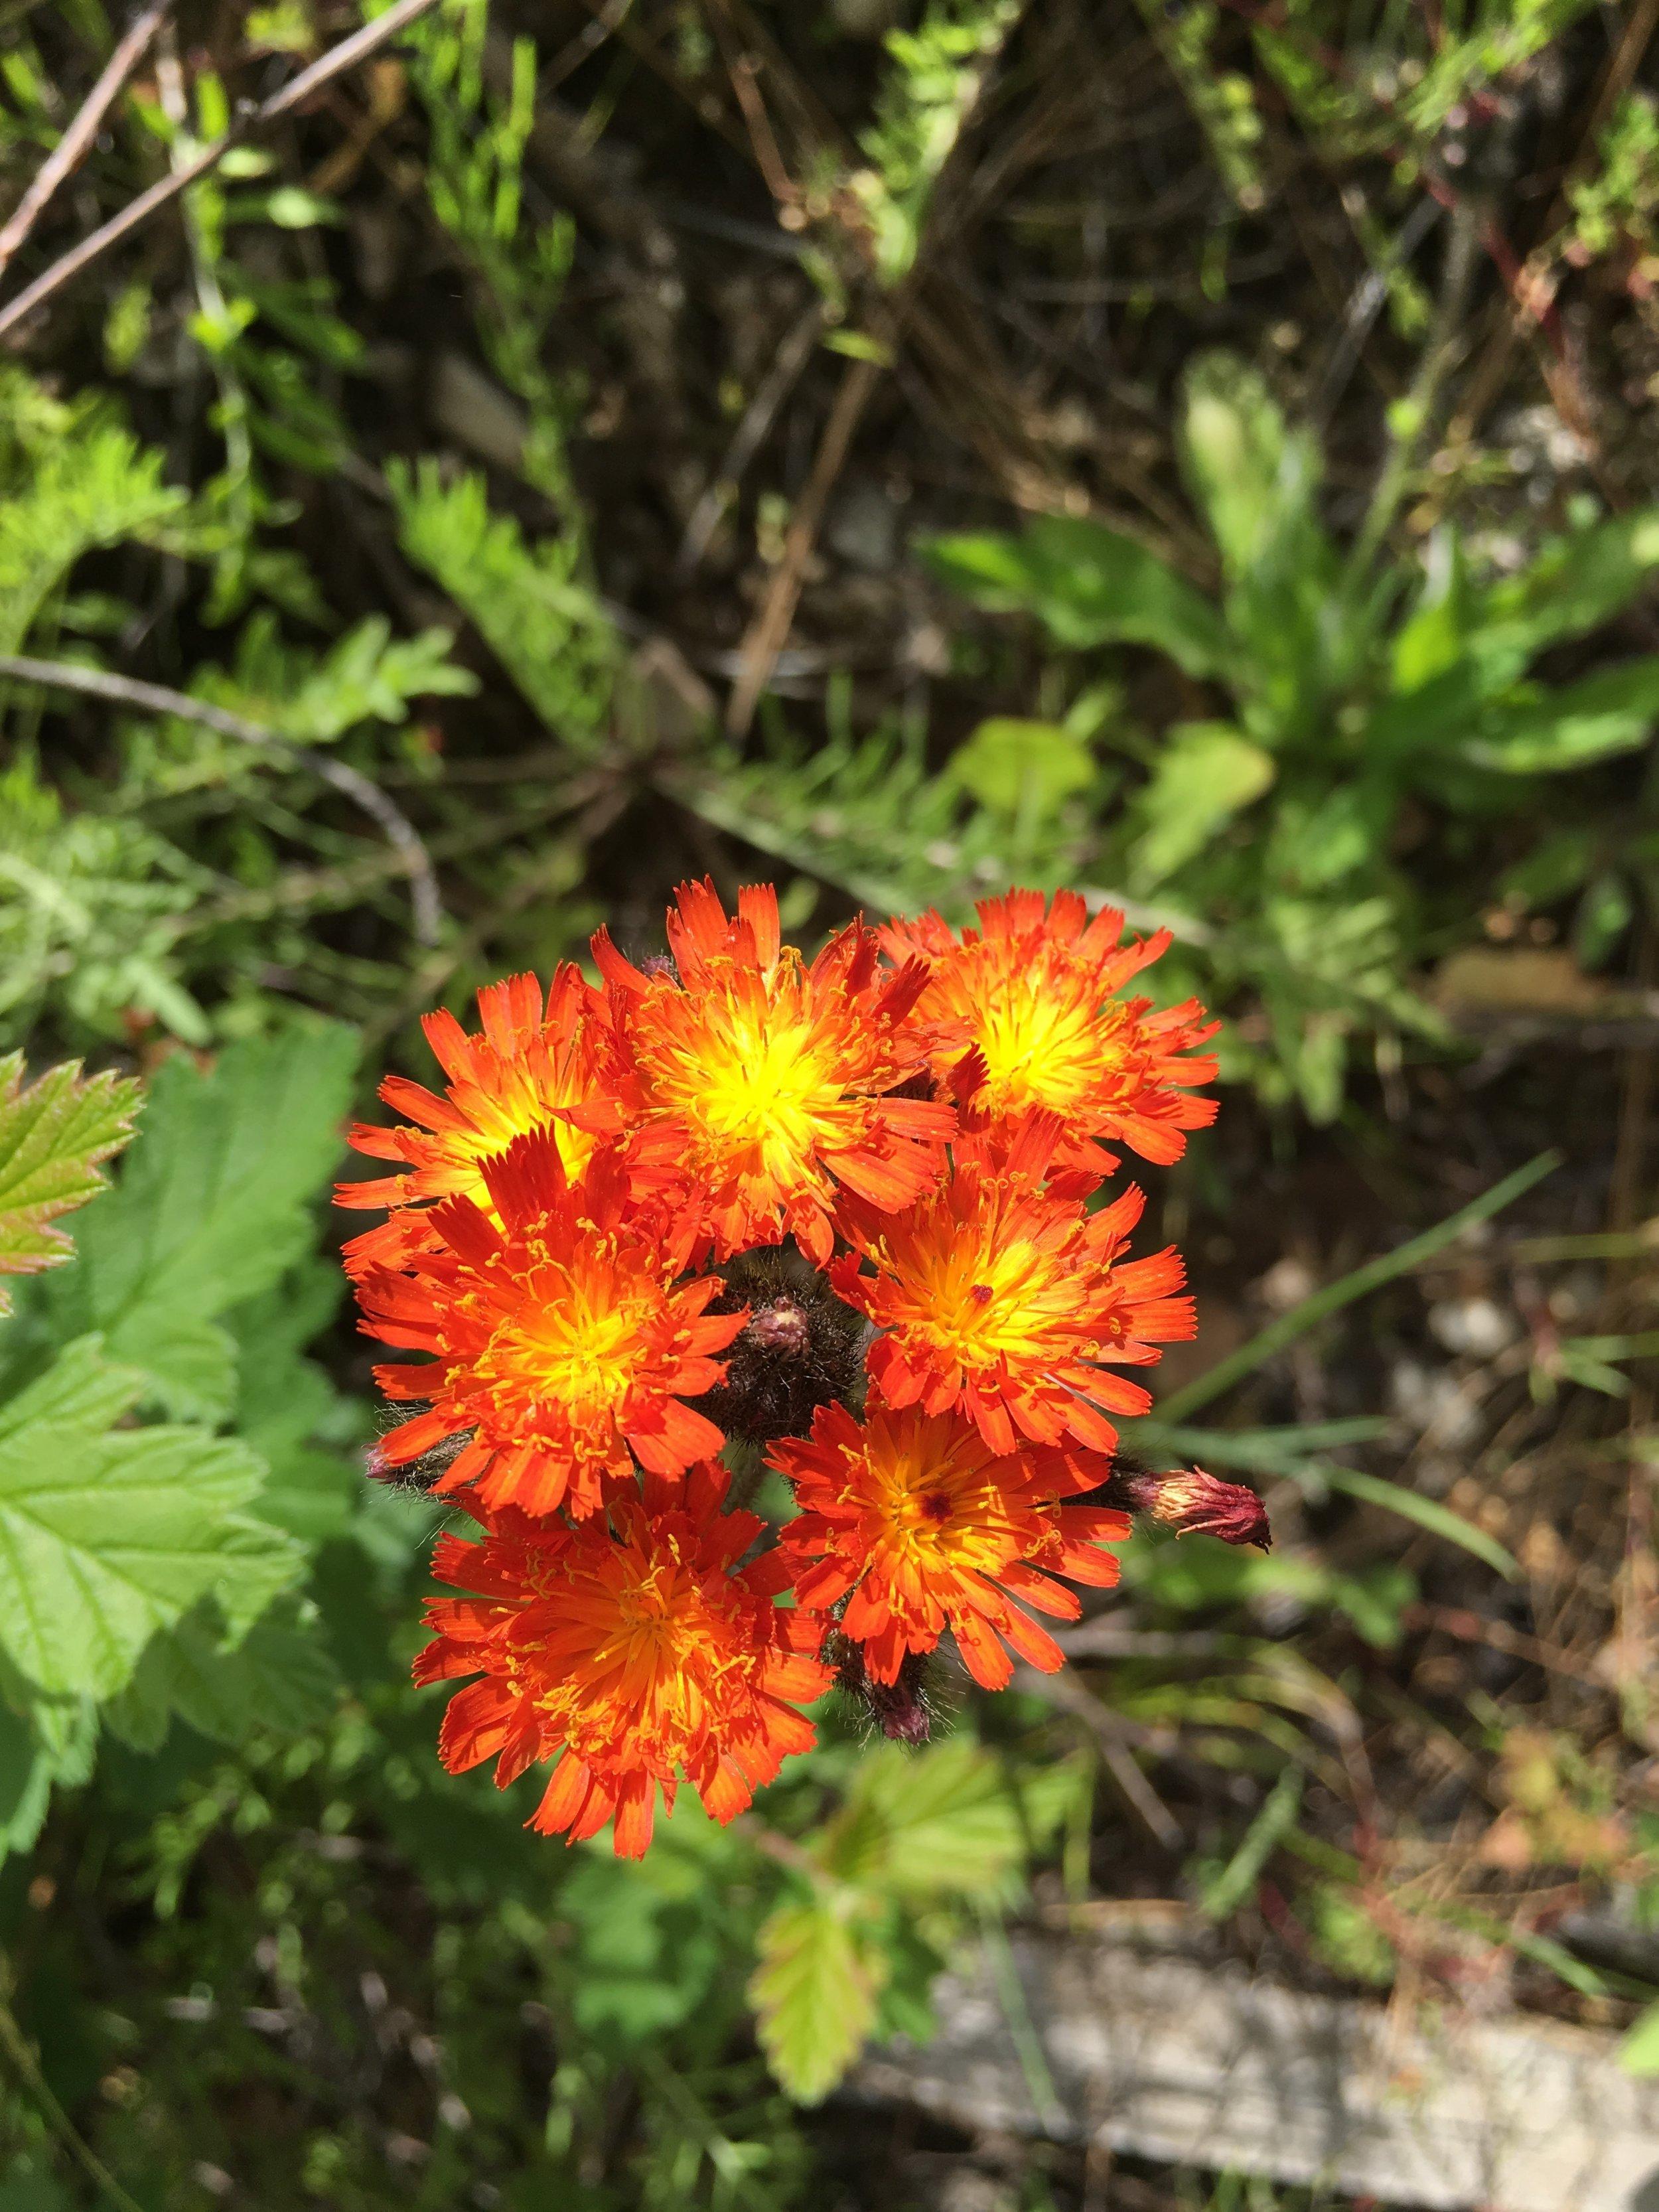 Close up of orange hawkweed flowers.